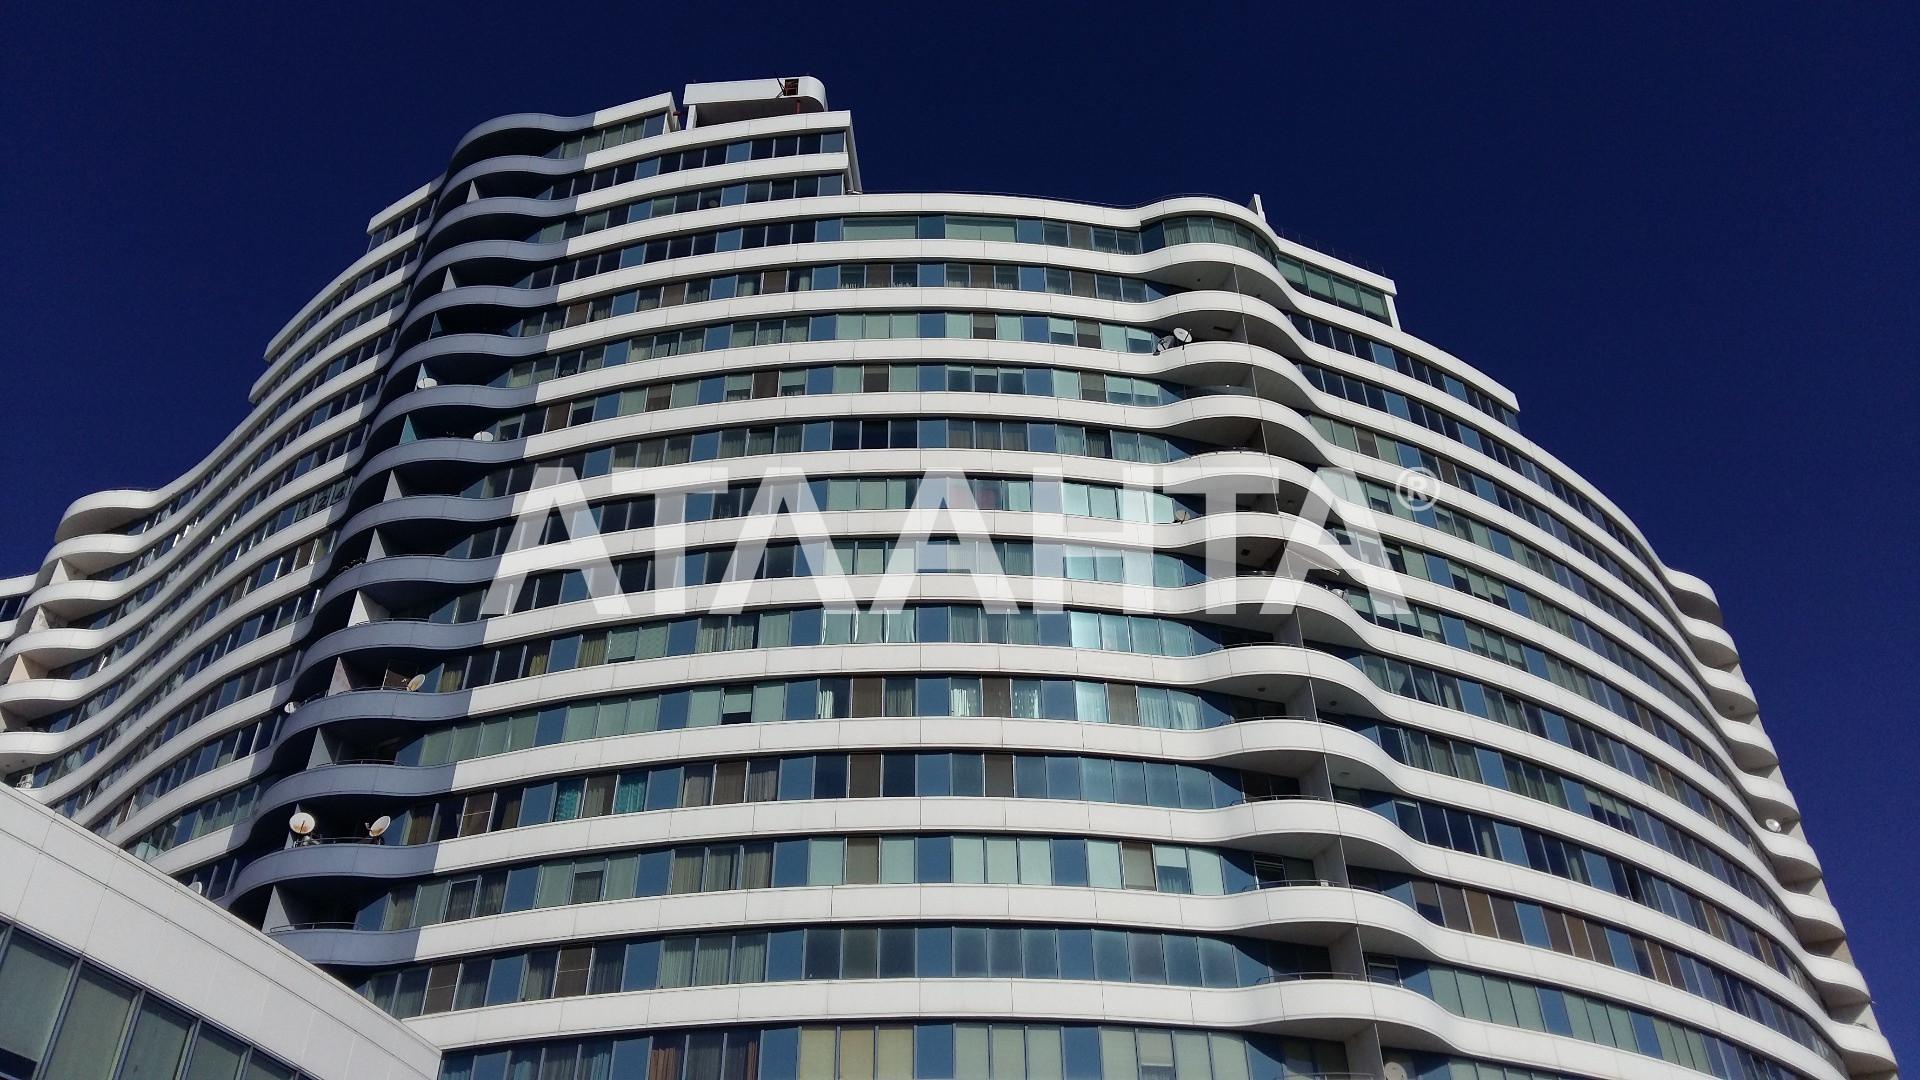 Продается 2-комнатная Квартира на ул. Литературная — 120 000 у.е. (фото №15)